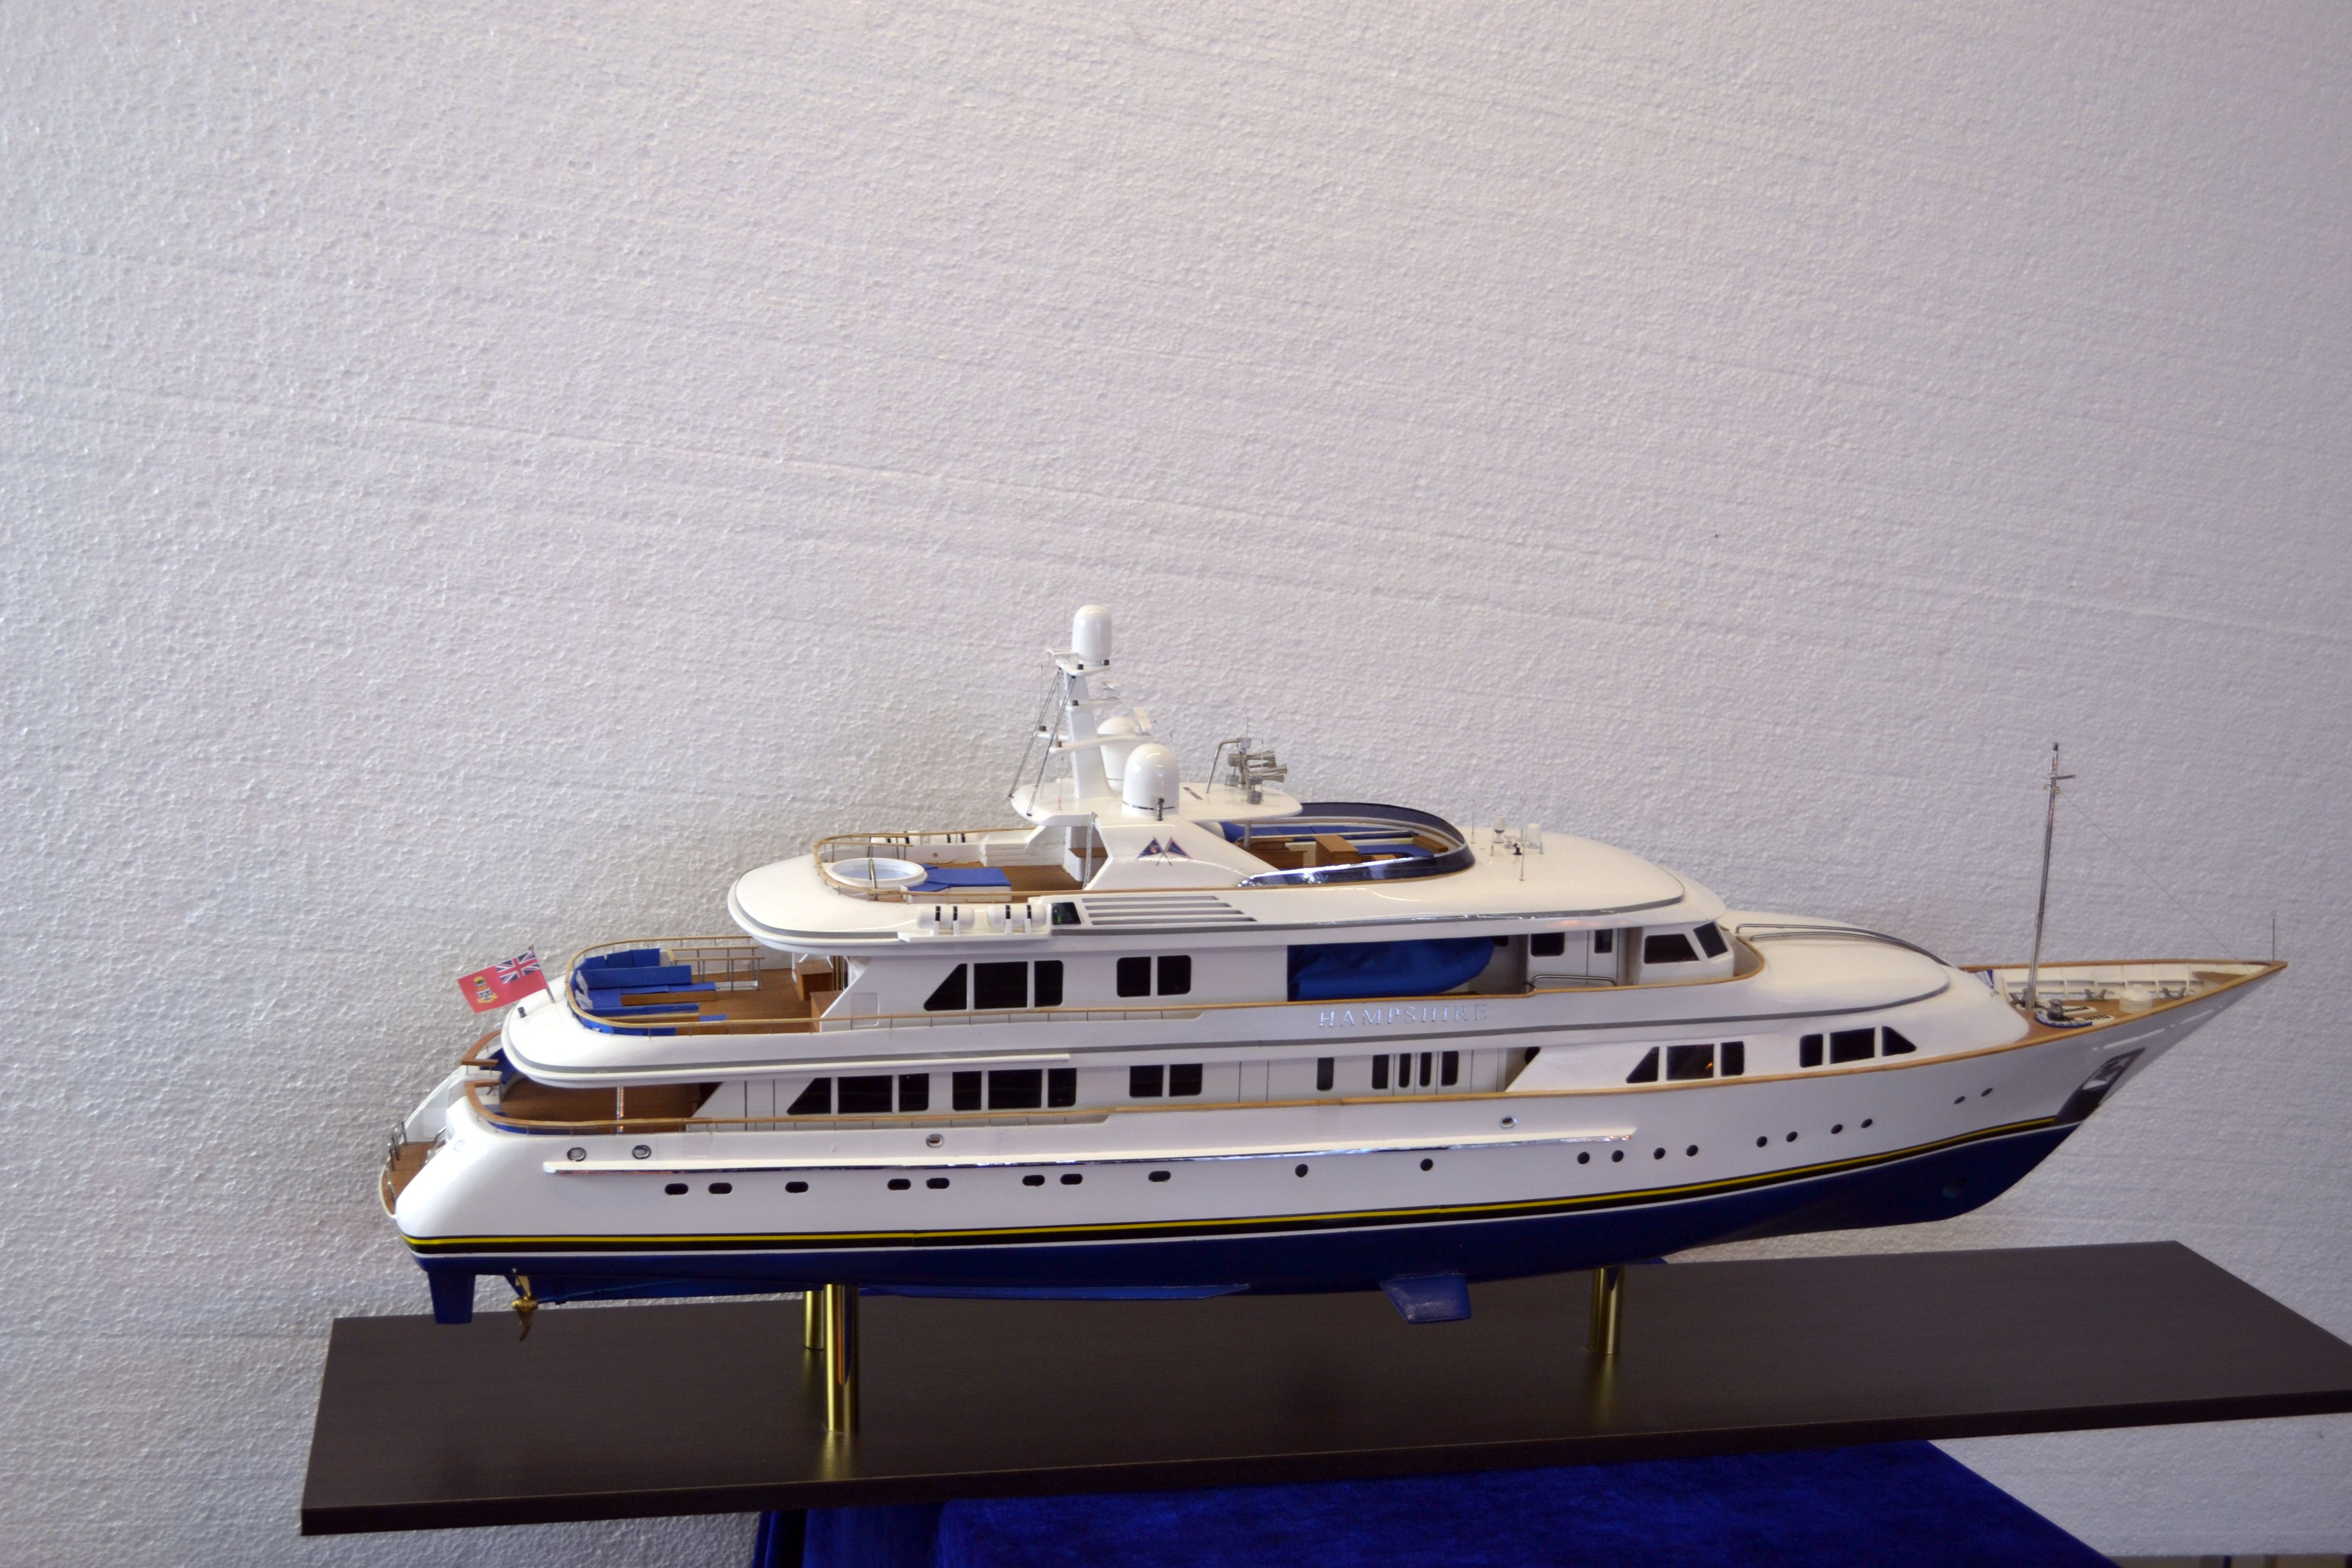 1492-6723-My-Hampshire-Custom-Built-Model-Yacht